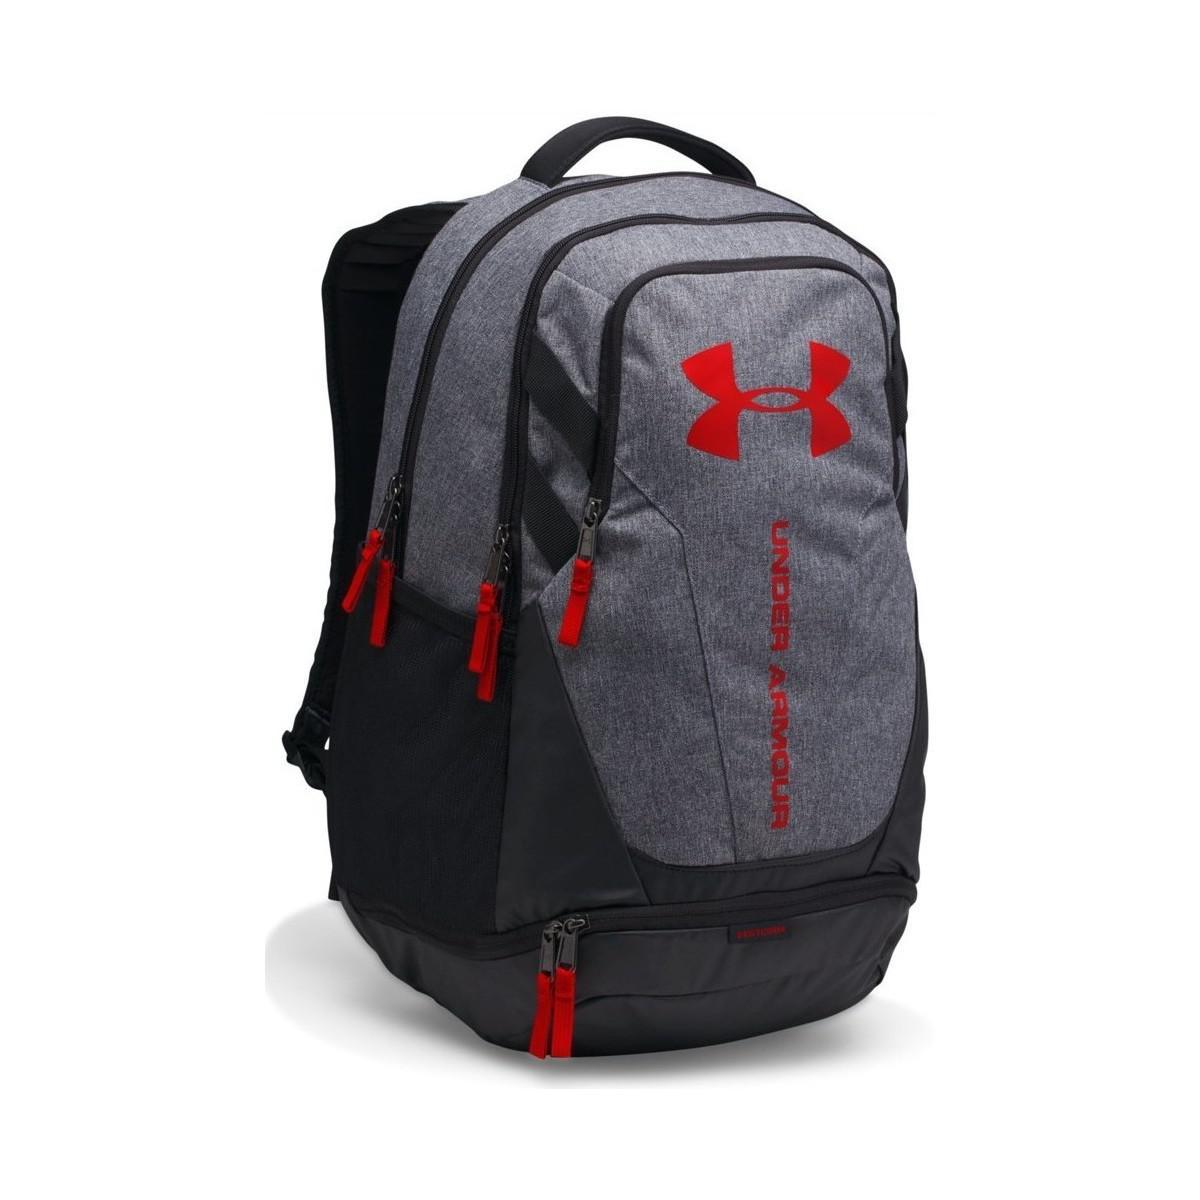 Under Armour Hustle 3.0 Backpack in Black for Men - Lyst 2456bedab98f8